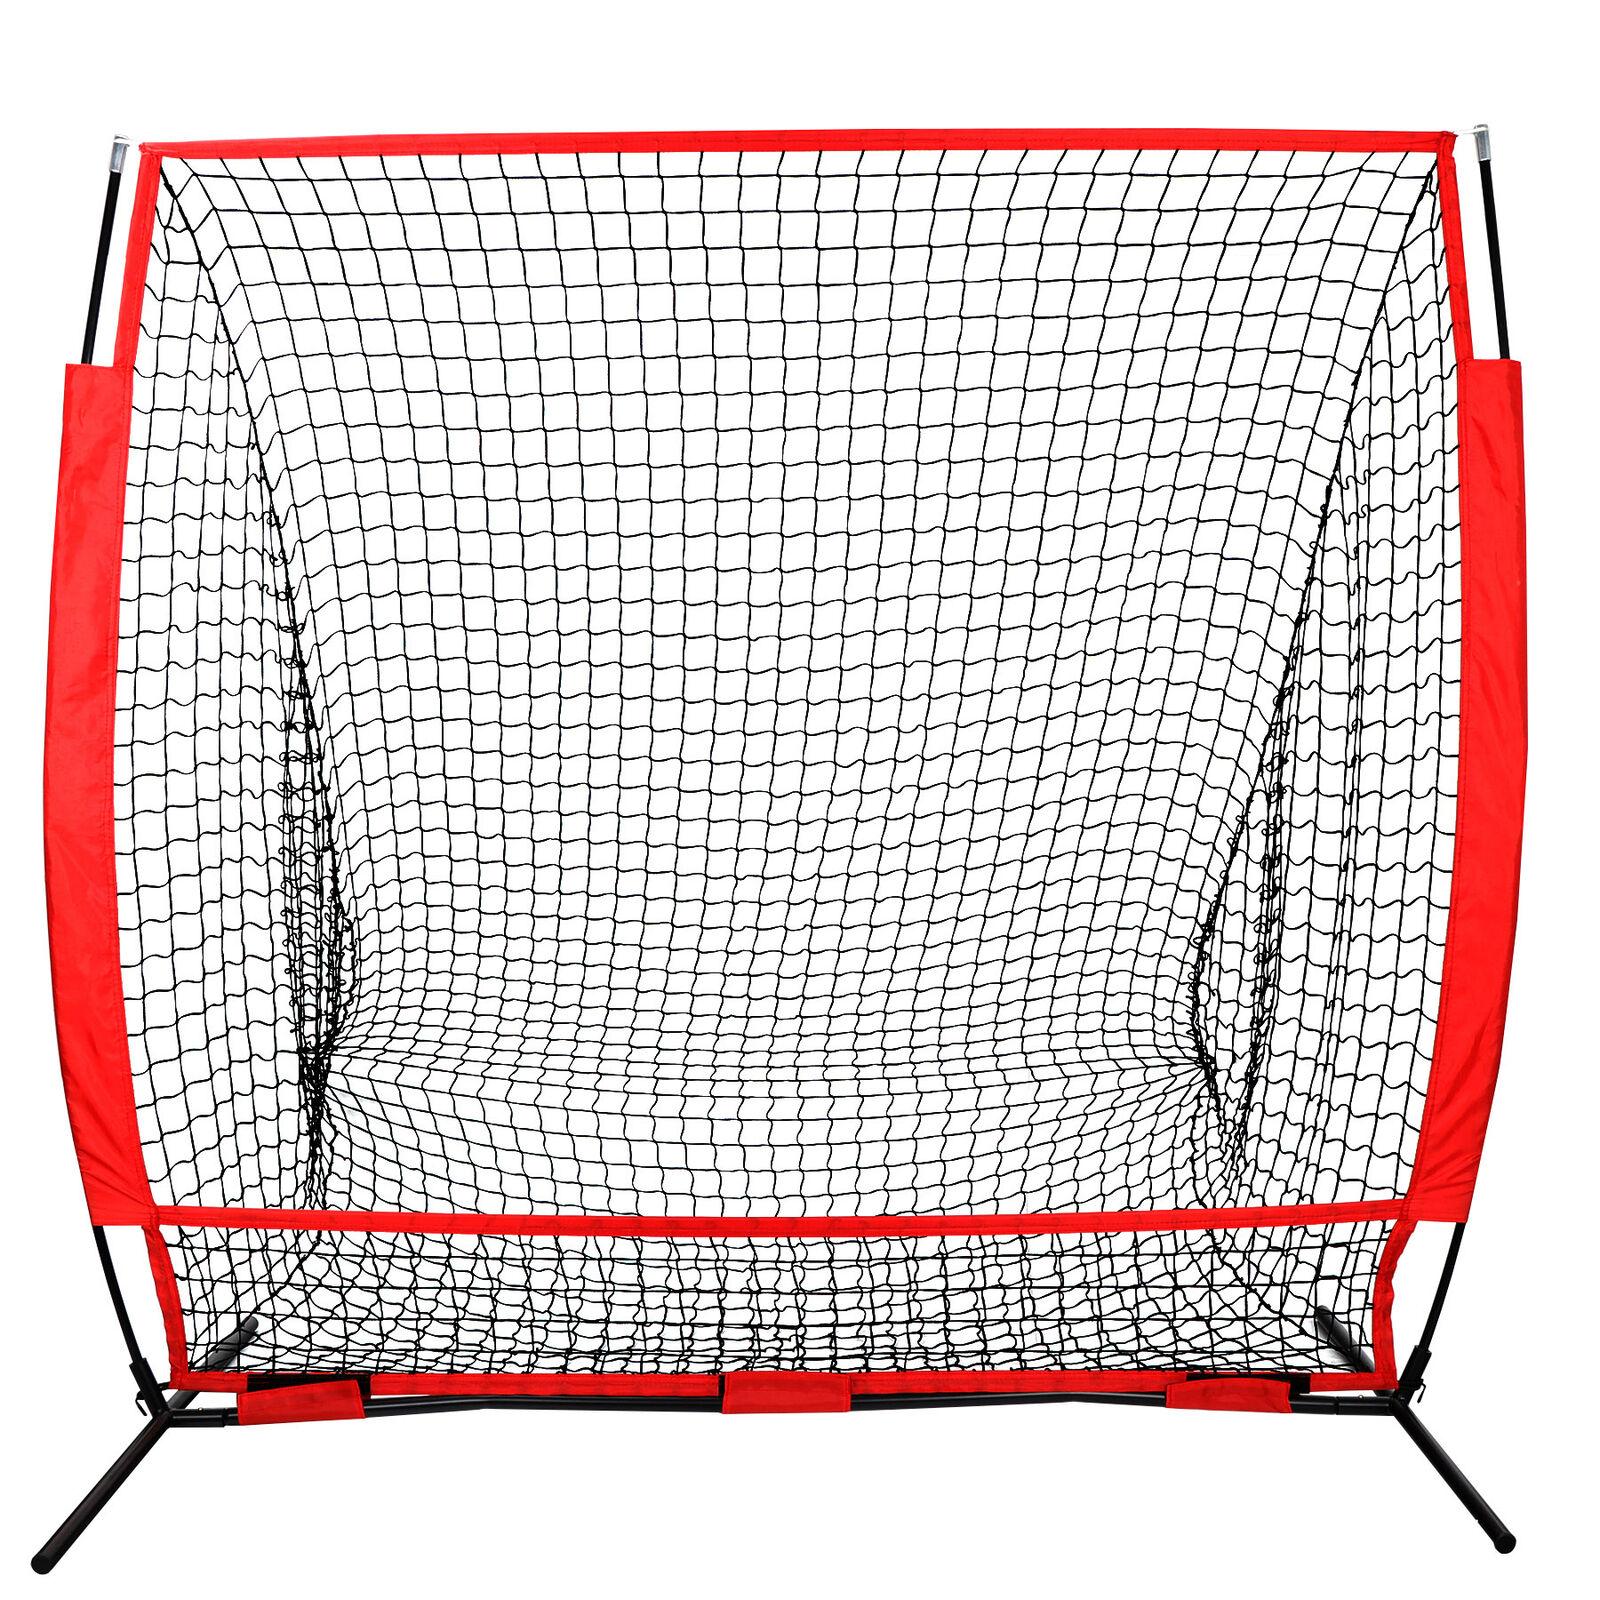 5 x 5′ Baseball Softball Net Practice Hitting Pitching Batting & Catching W/ Bag Baseball & Softball